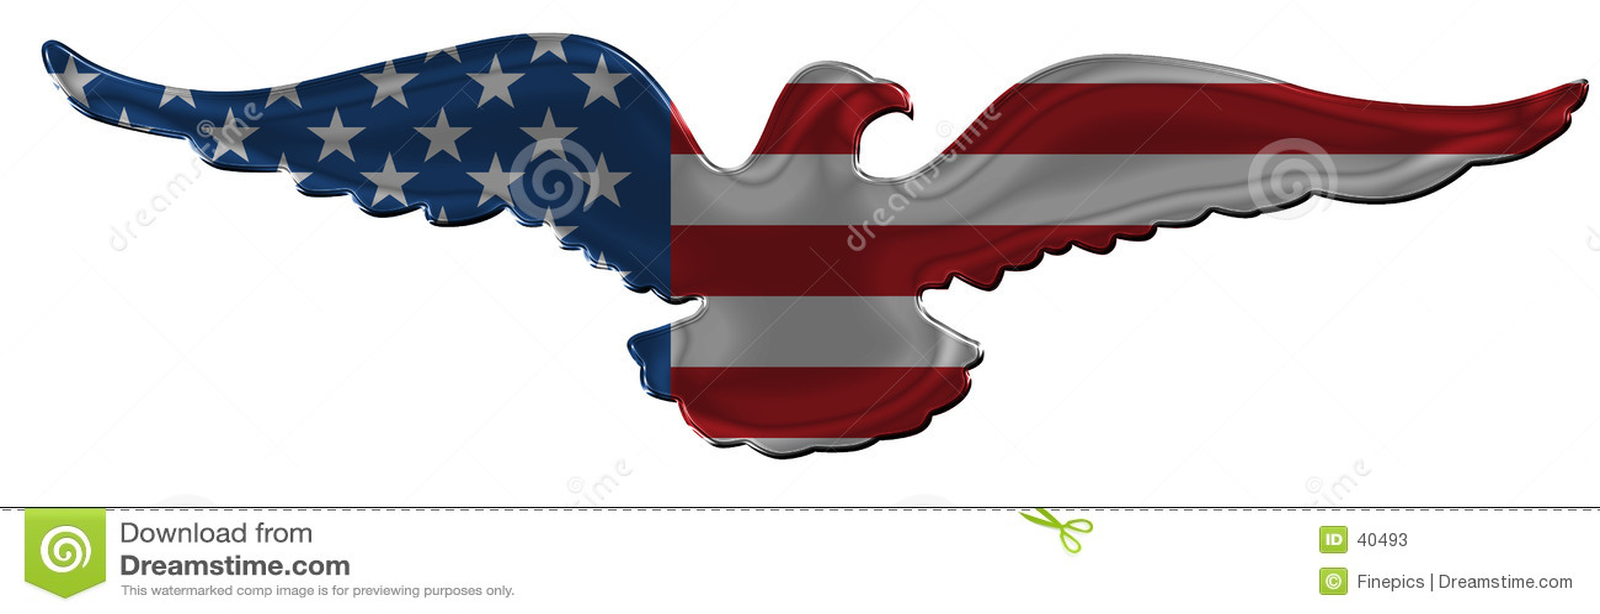 американский орел значка 2